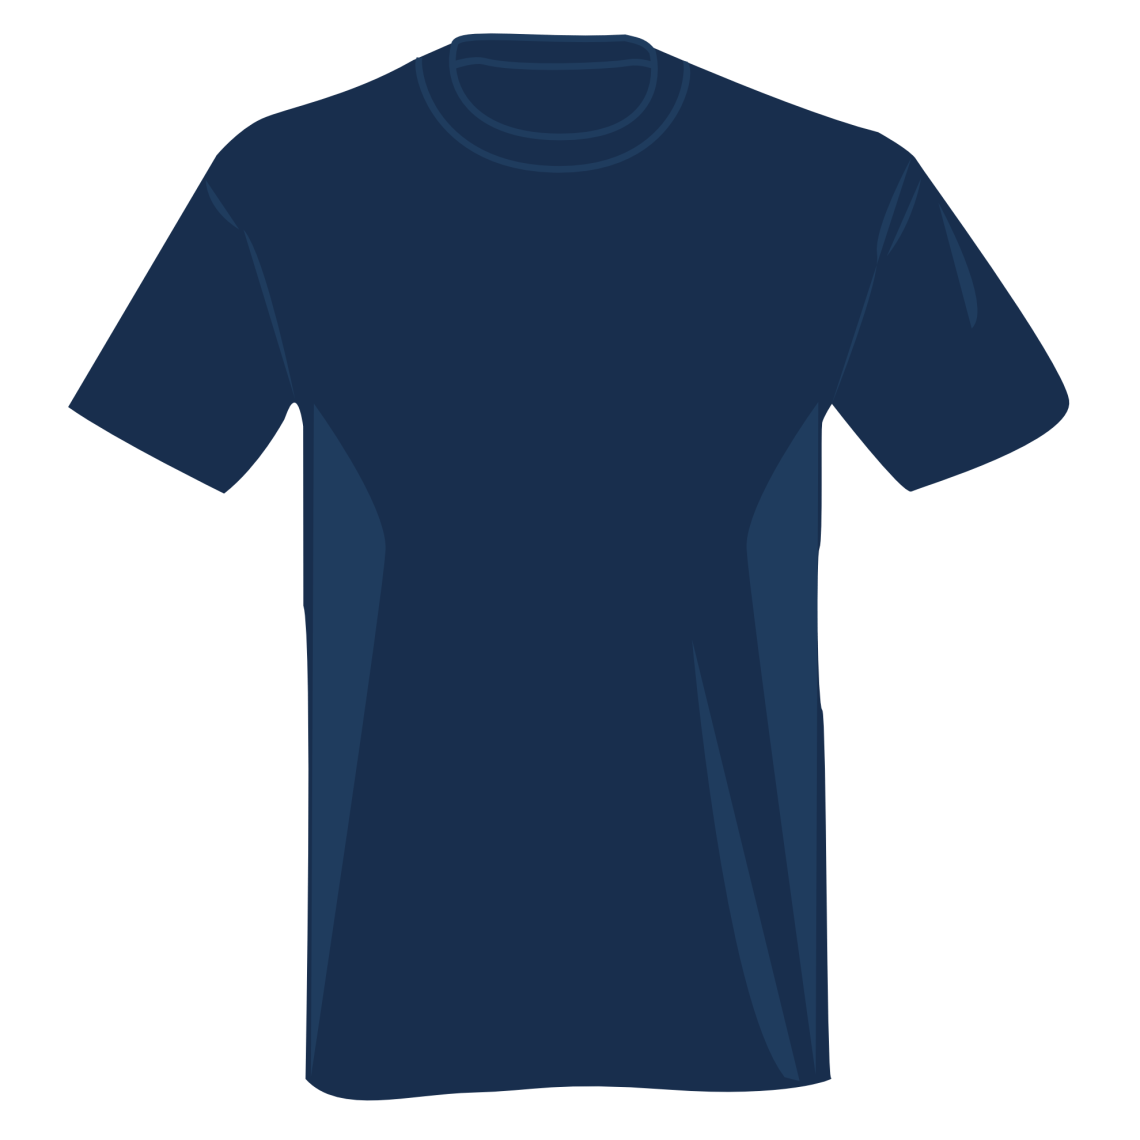 Download Blue Tshirt - ClipArt Best